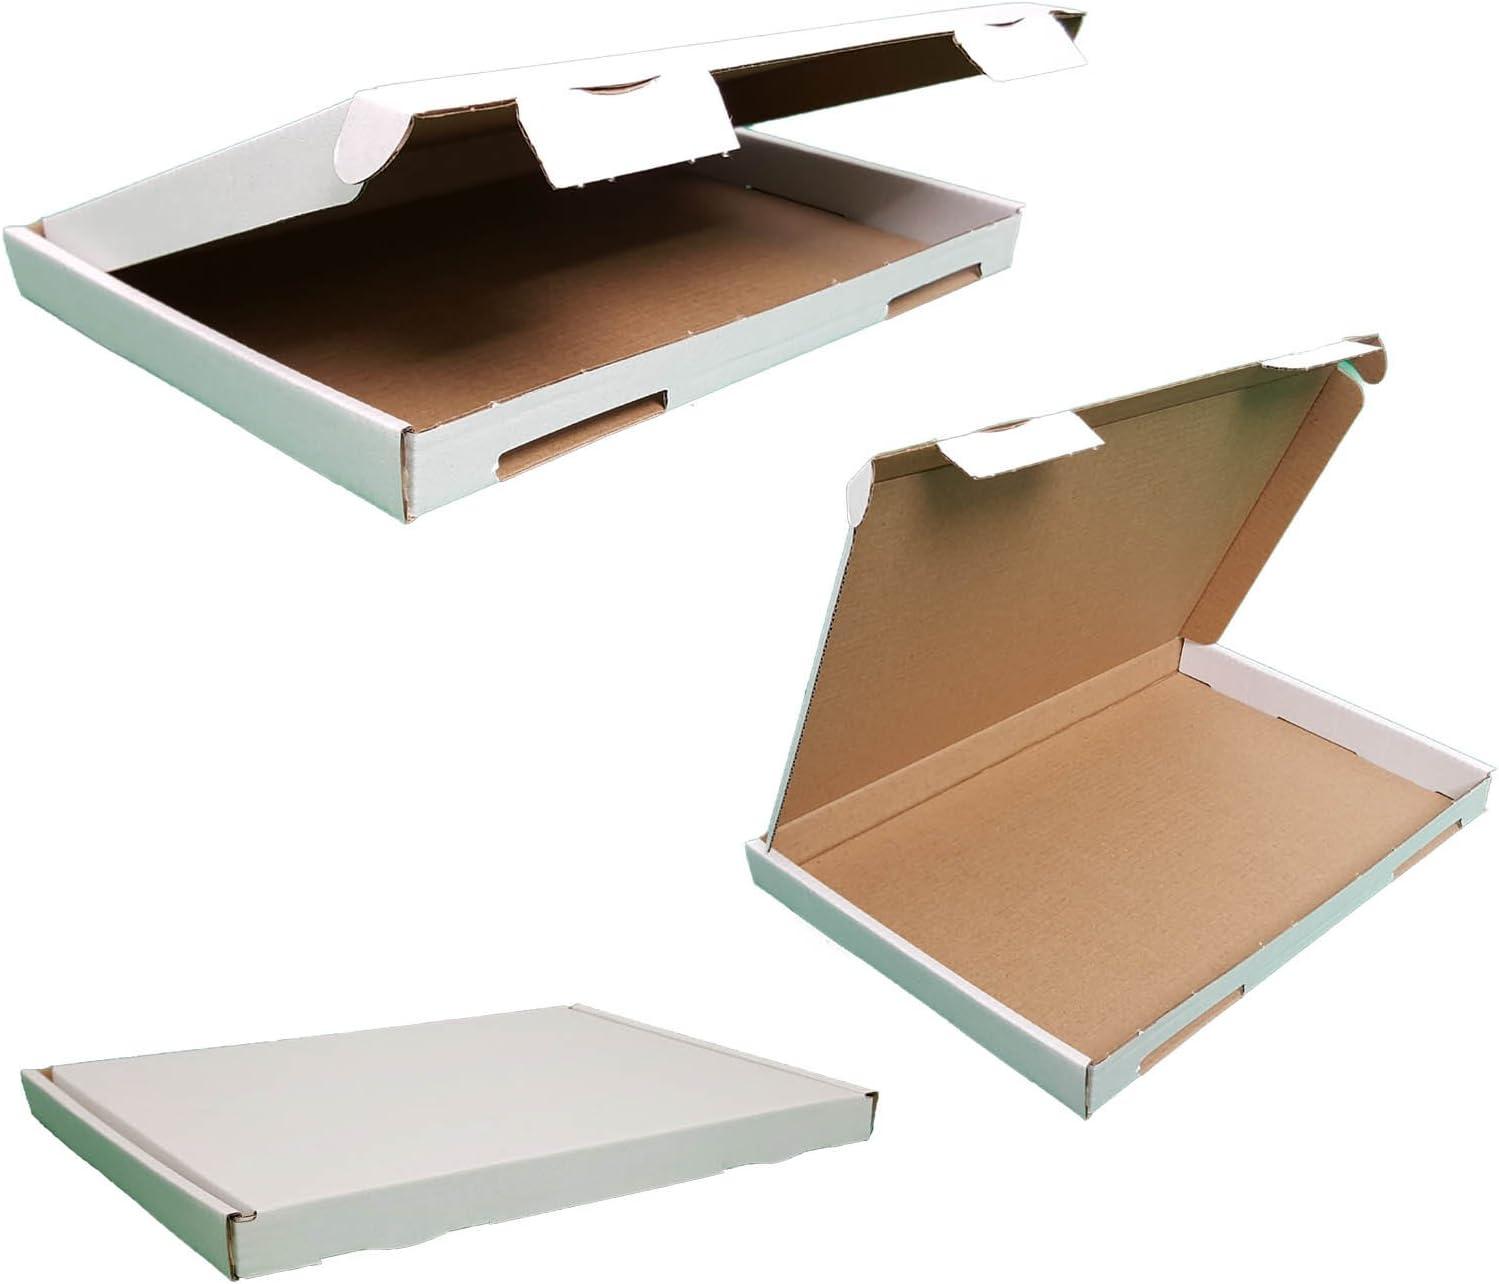 Braun verpacking 200 Gro/ßbriefkartons Versandkartons 165 x 125 x 20 mm GB-0